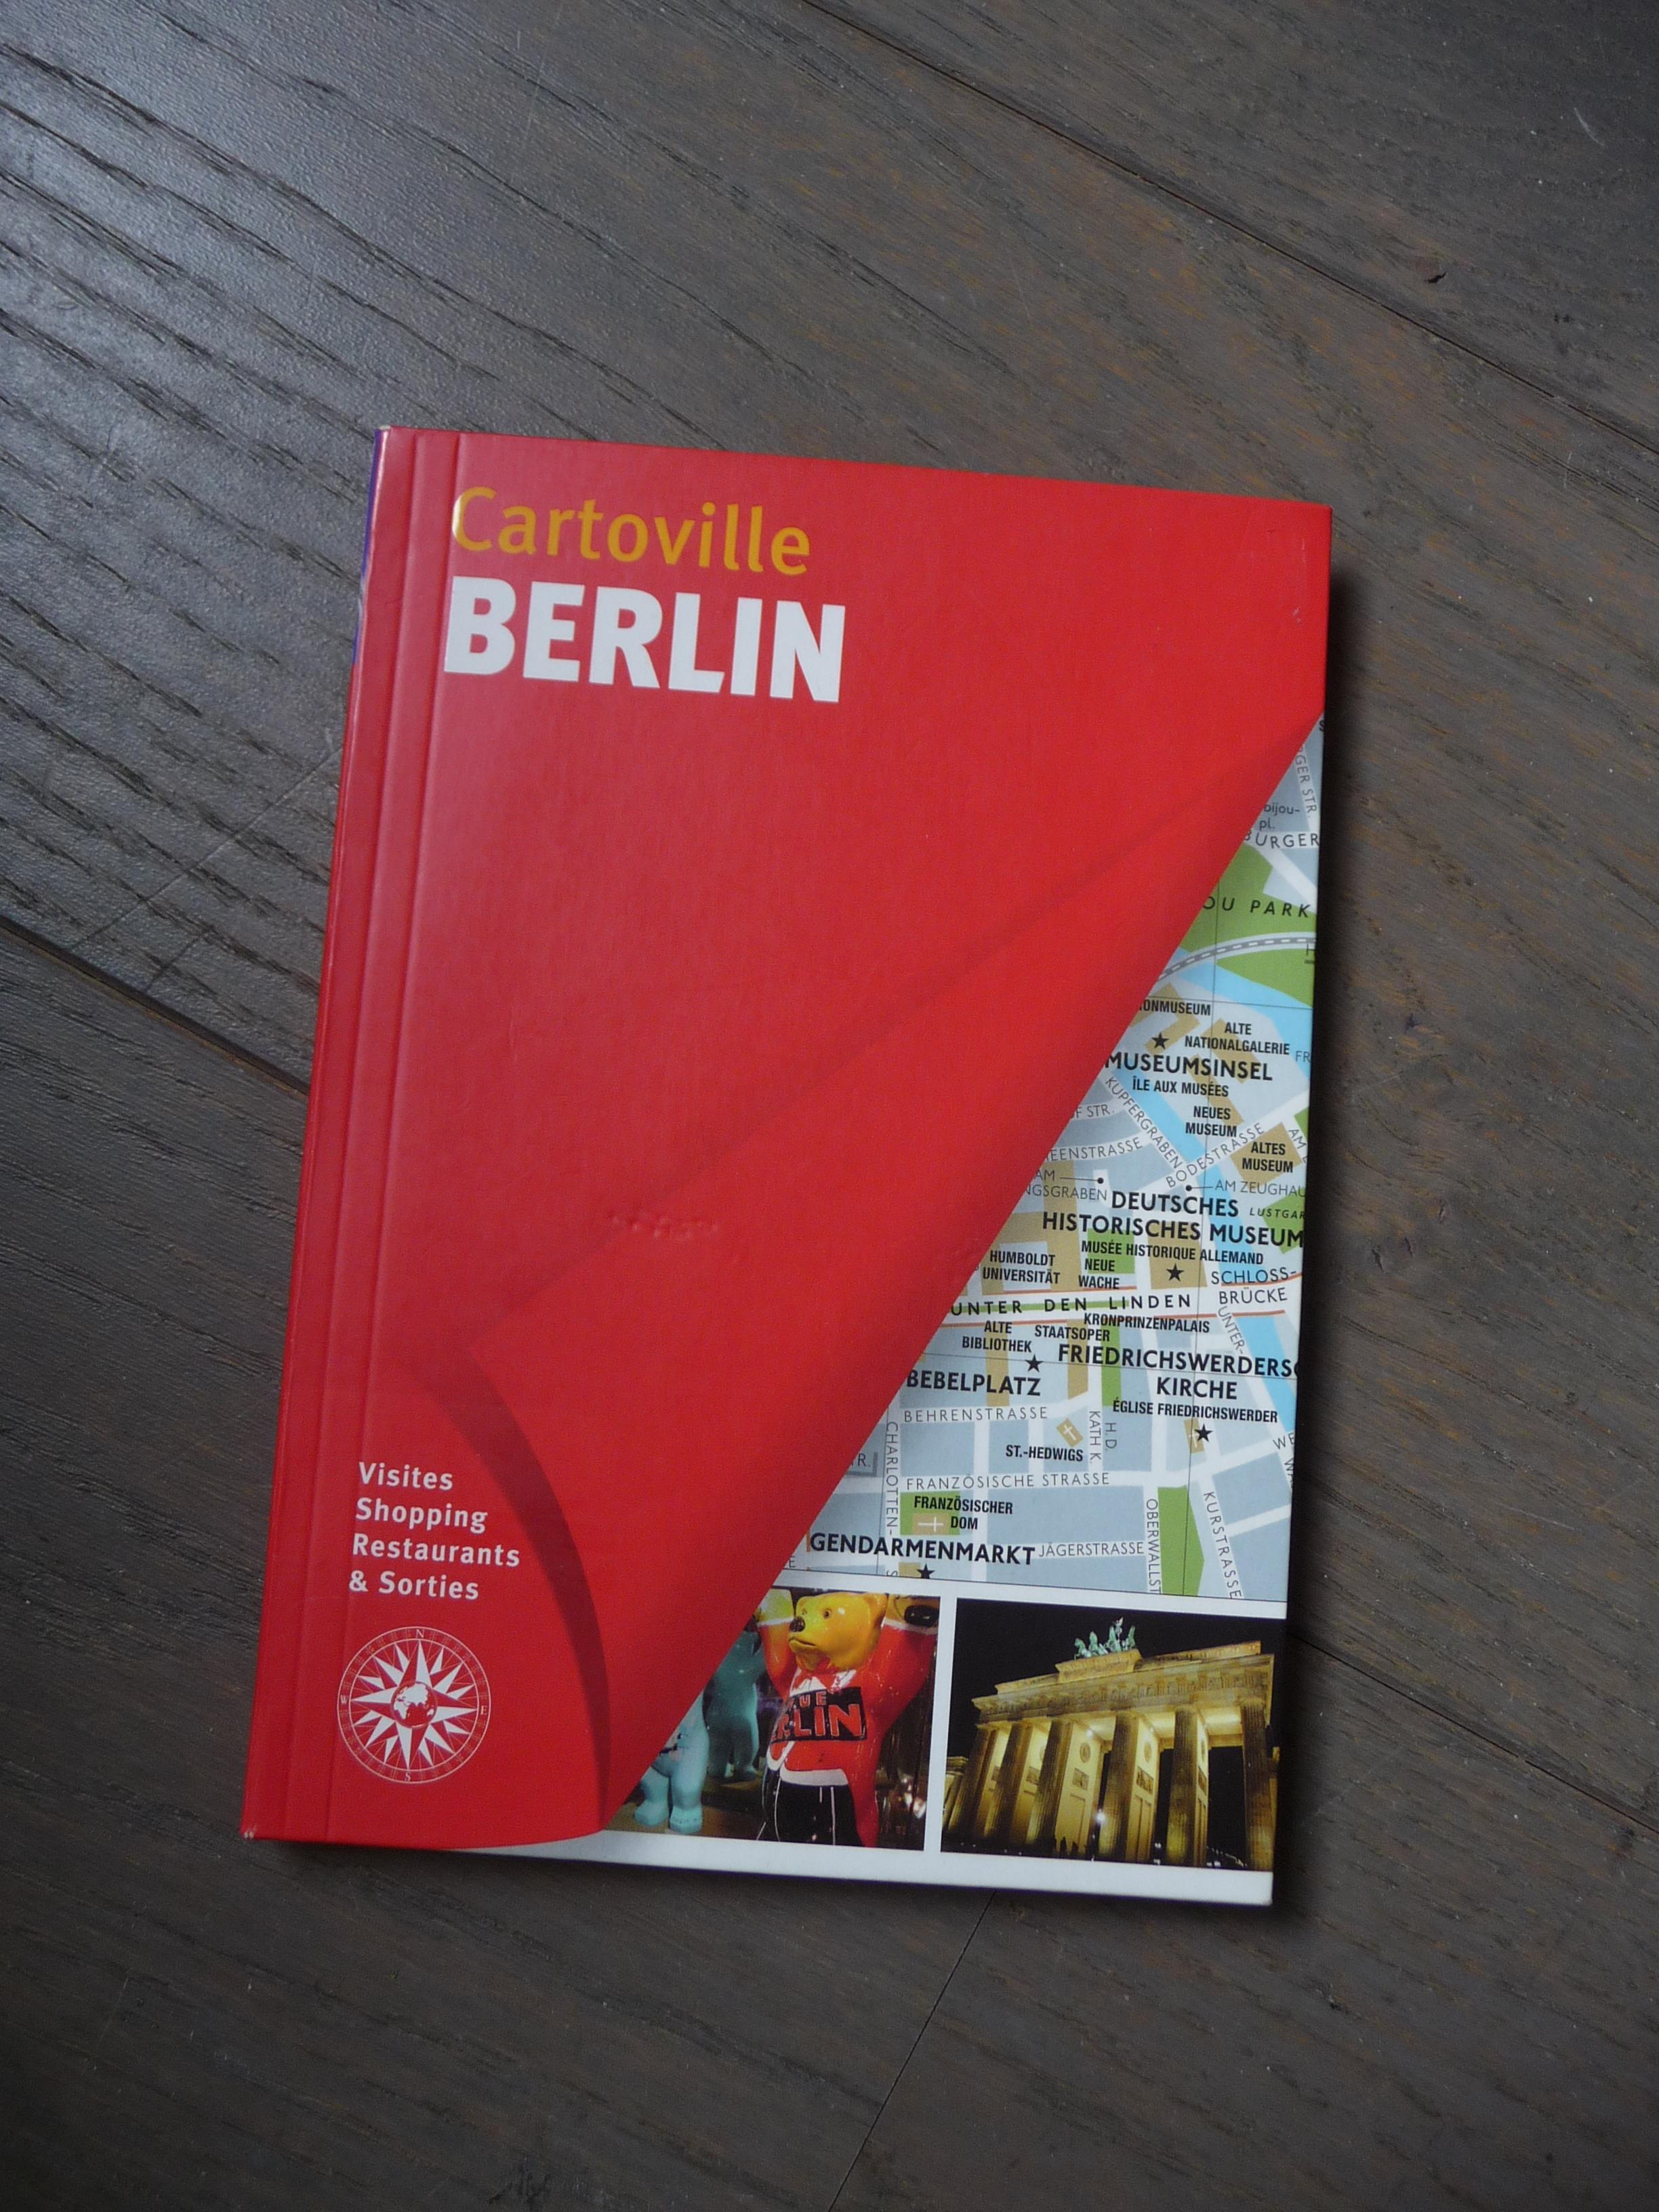 troc de troc cartoville berlin image 0